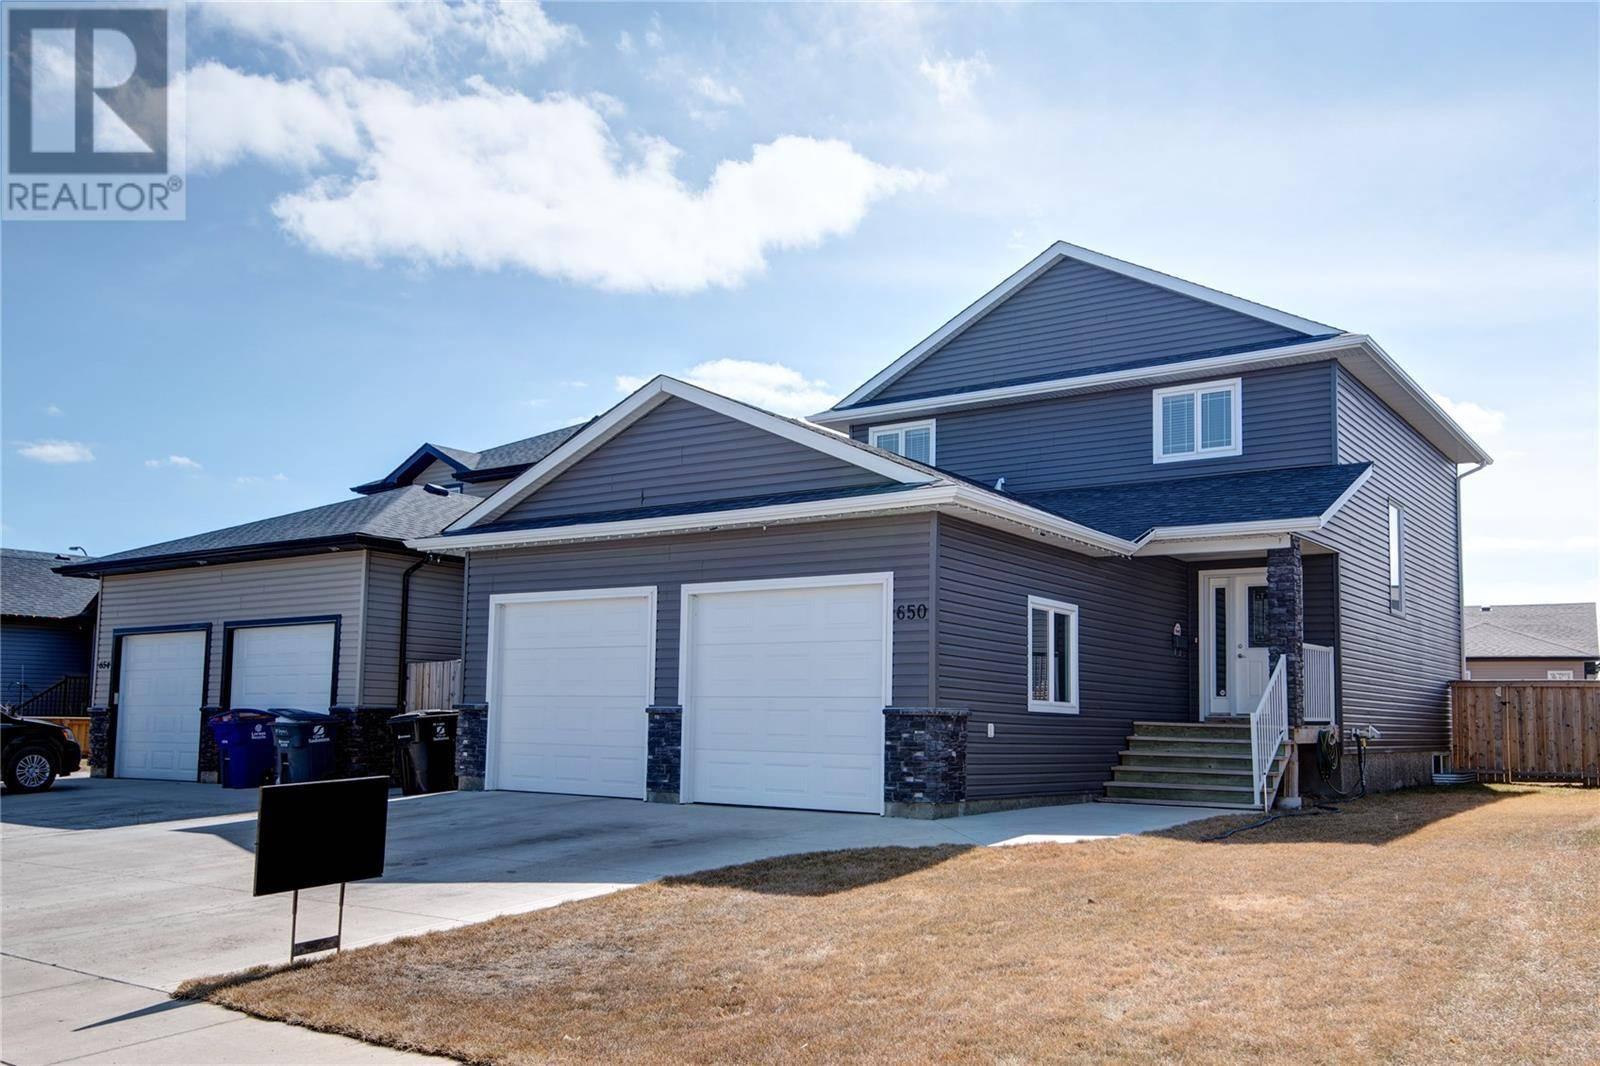 House for sale at 650 Hargreaves Ln Saskatoon Saskatchewan - MLS: SK778321